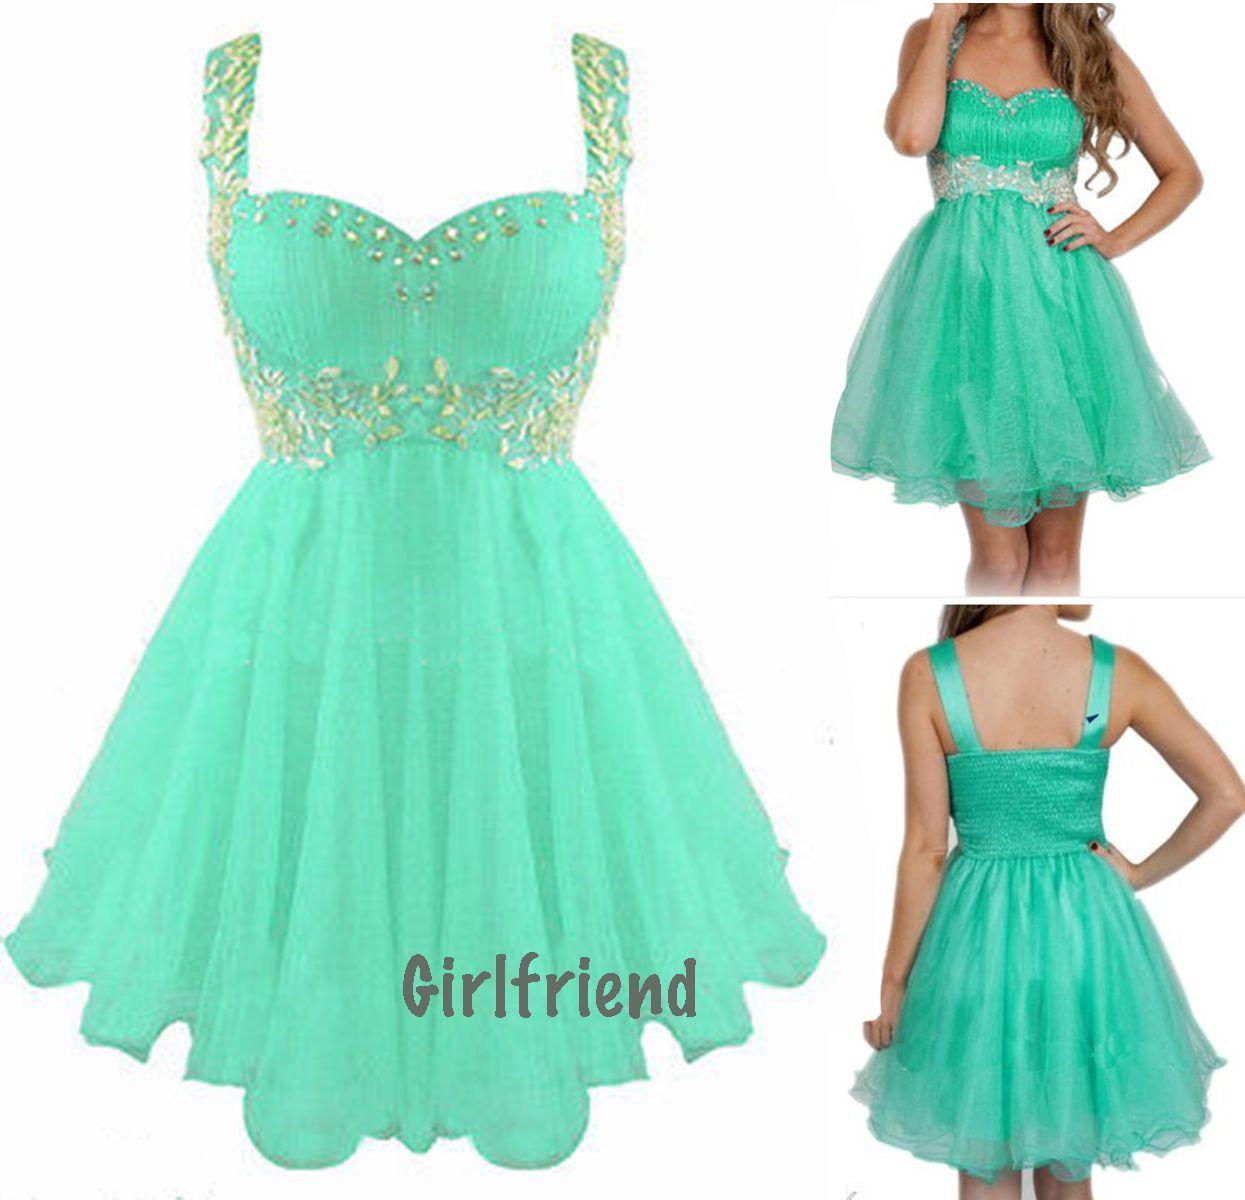 prom dresses tumblr - Pesquisa Google | Dresses | Pinterest | Prom ...